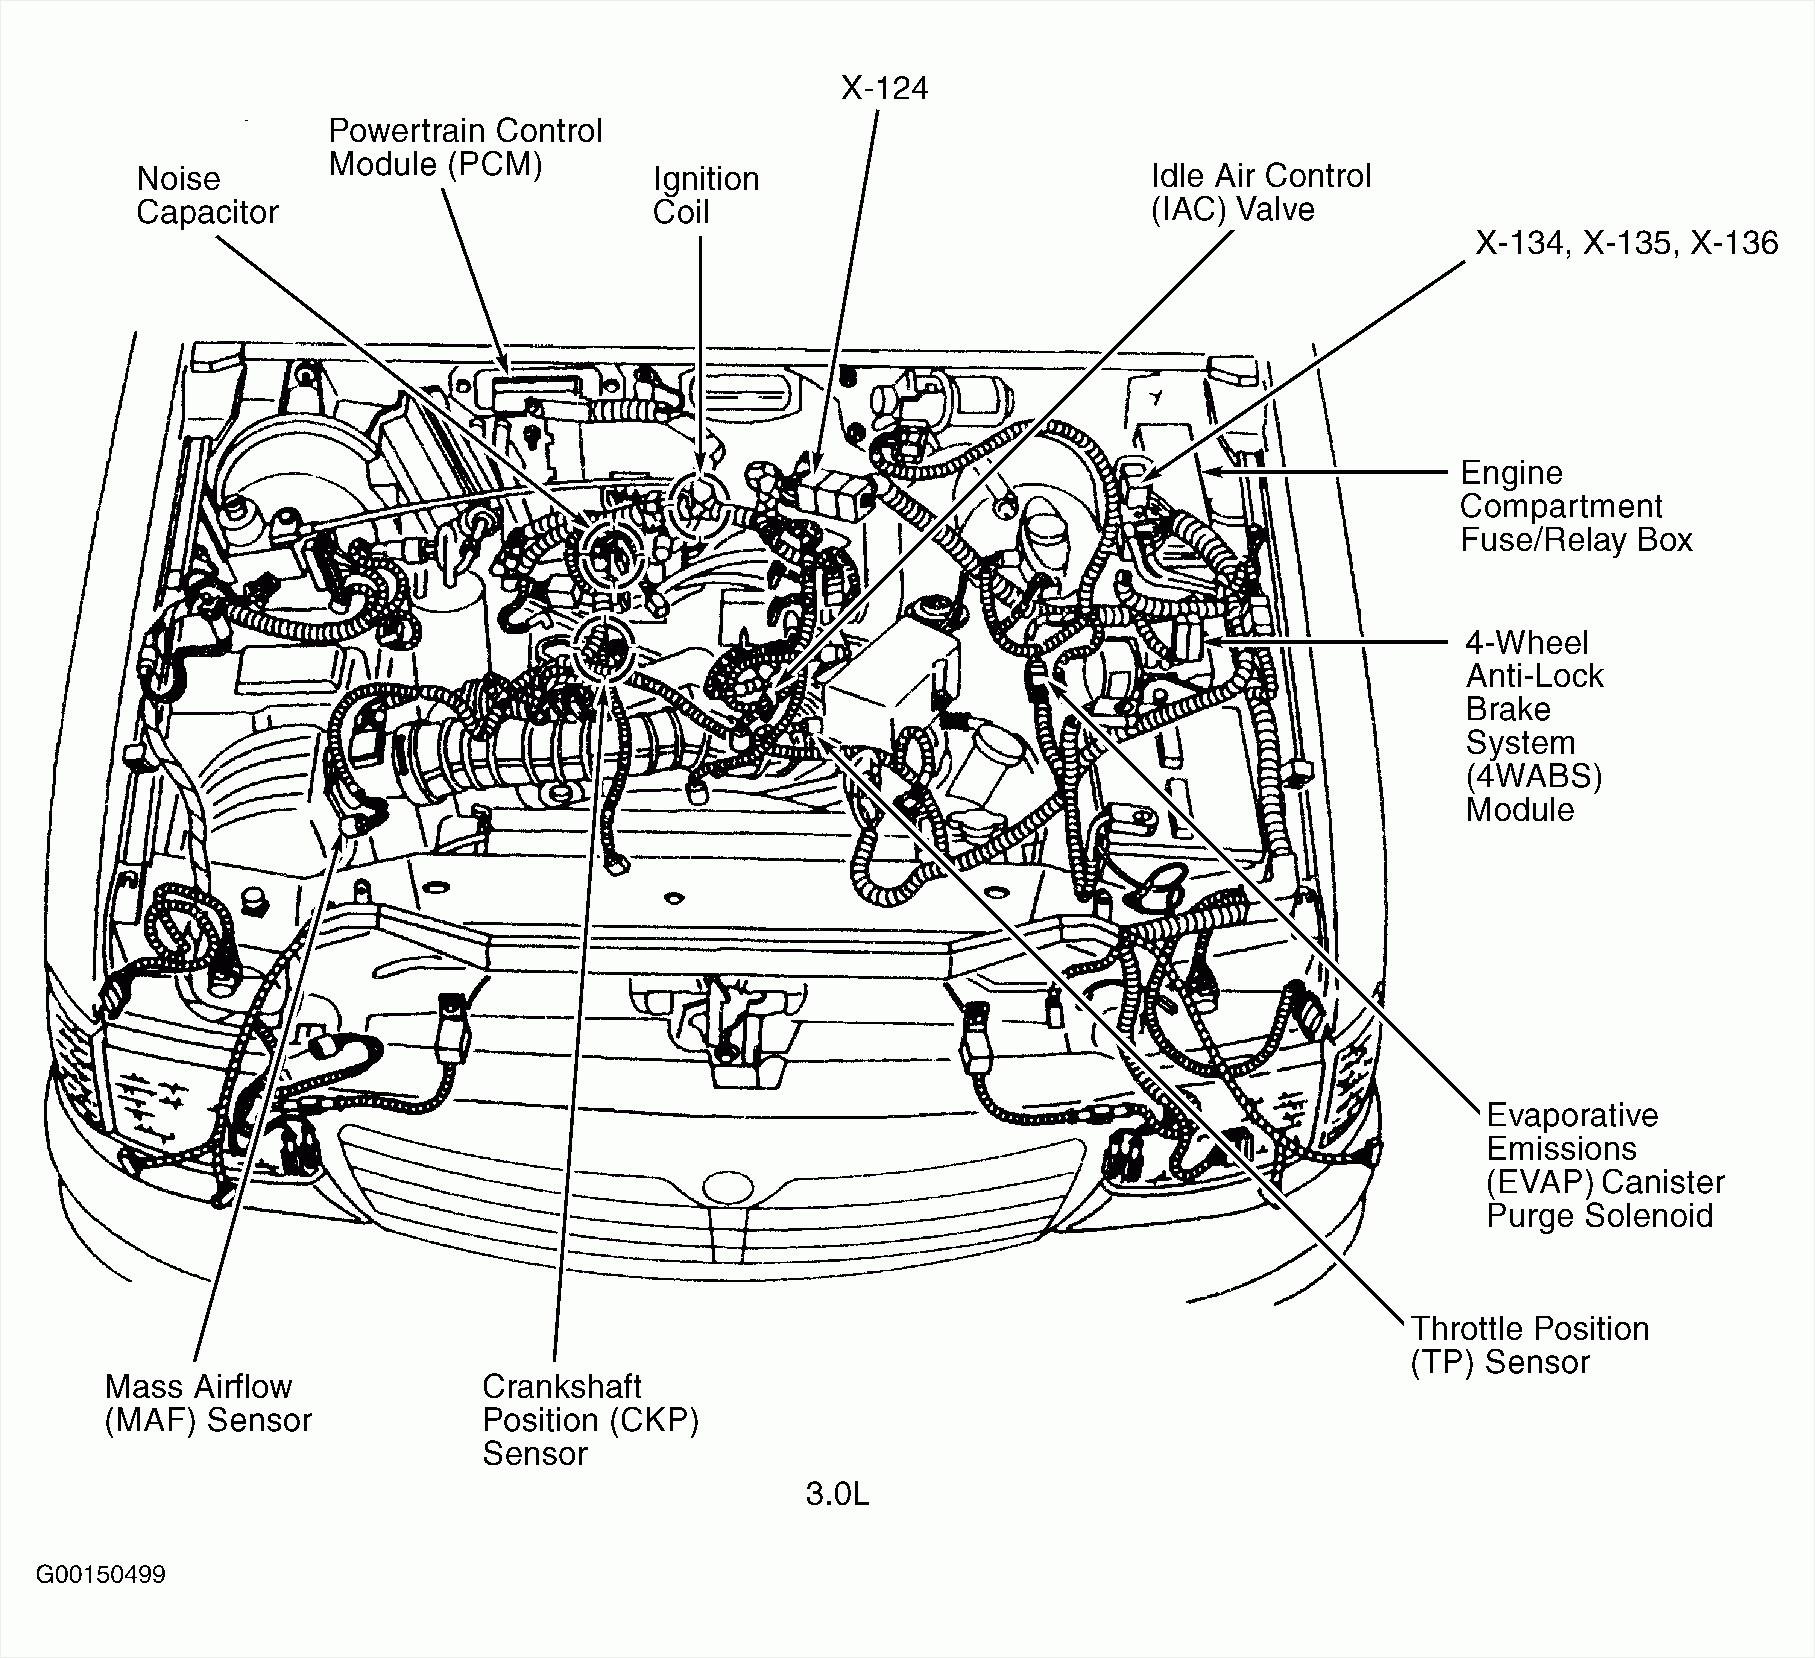 Honda Cd70 Engine Diagram Engine Valve Timing Diagram to Replace Timing Belt ford Ranger 3 Of Honda Cd70 Engine Diagram